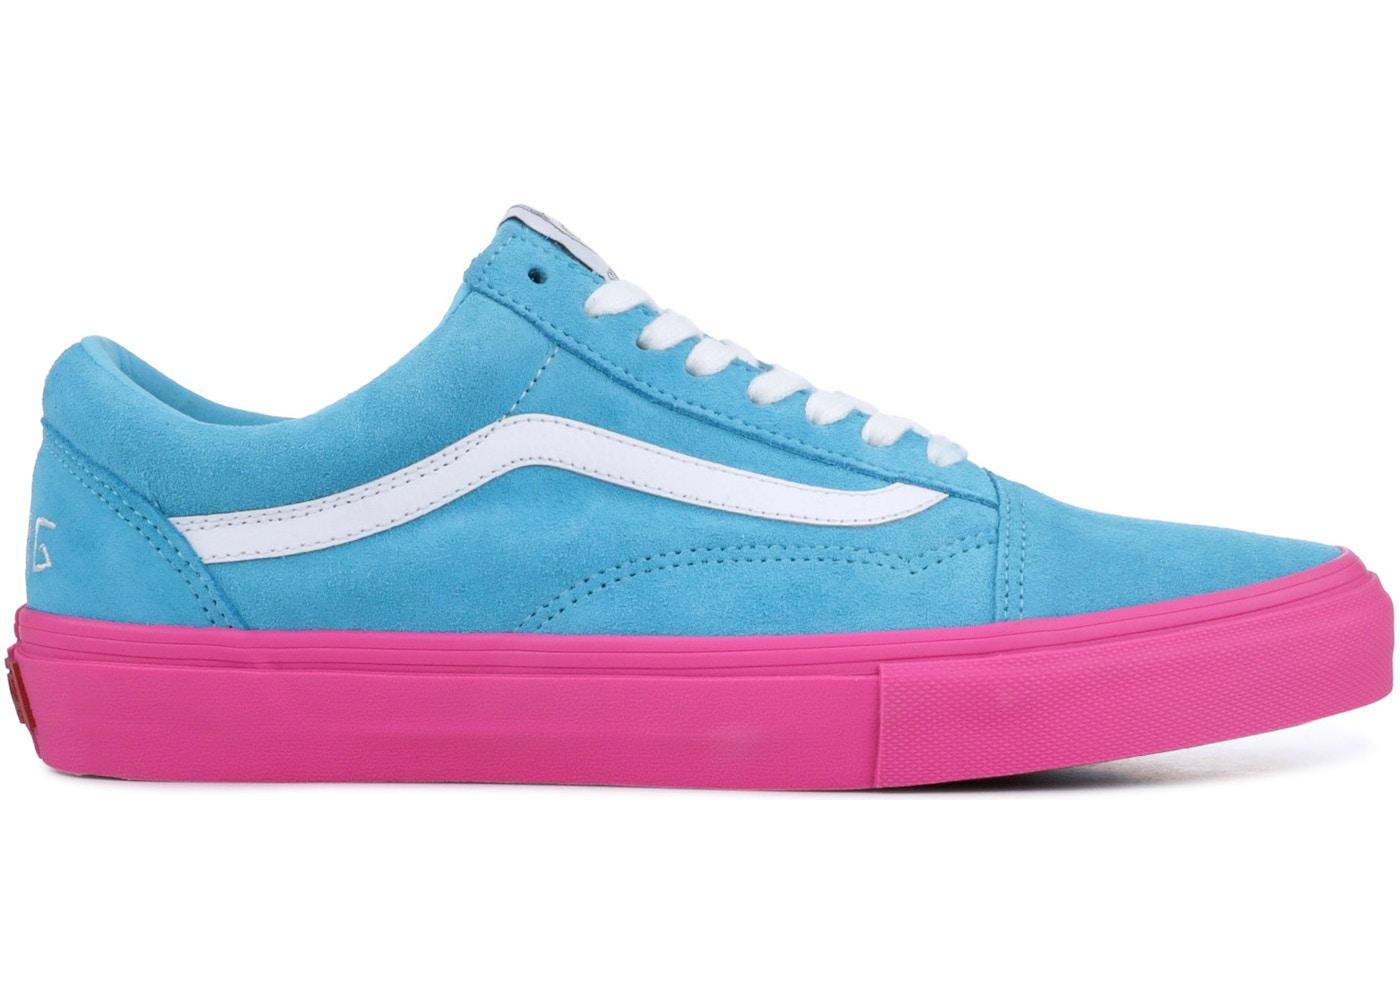 Vans Old Skool Pro S Golf Wang Blue Pink Vn0qhmf5e